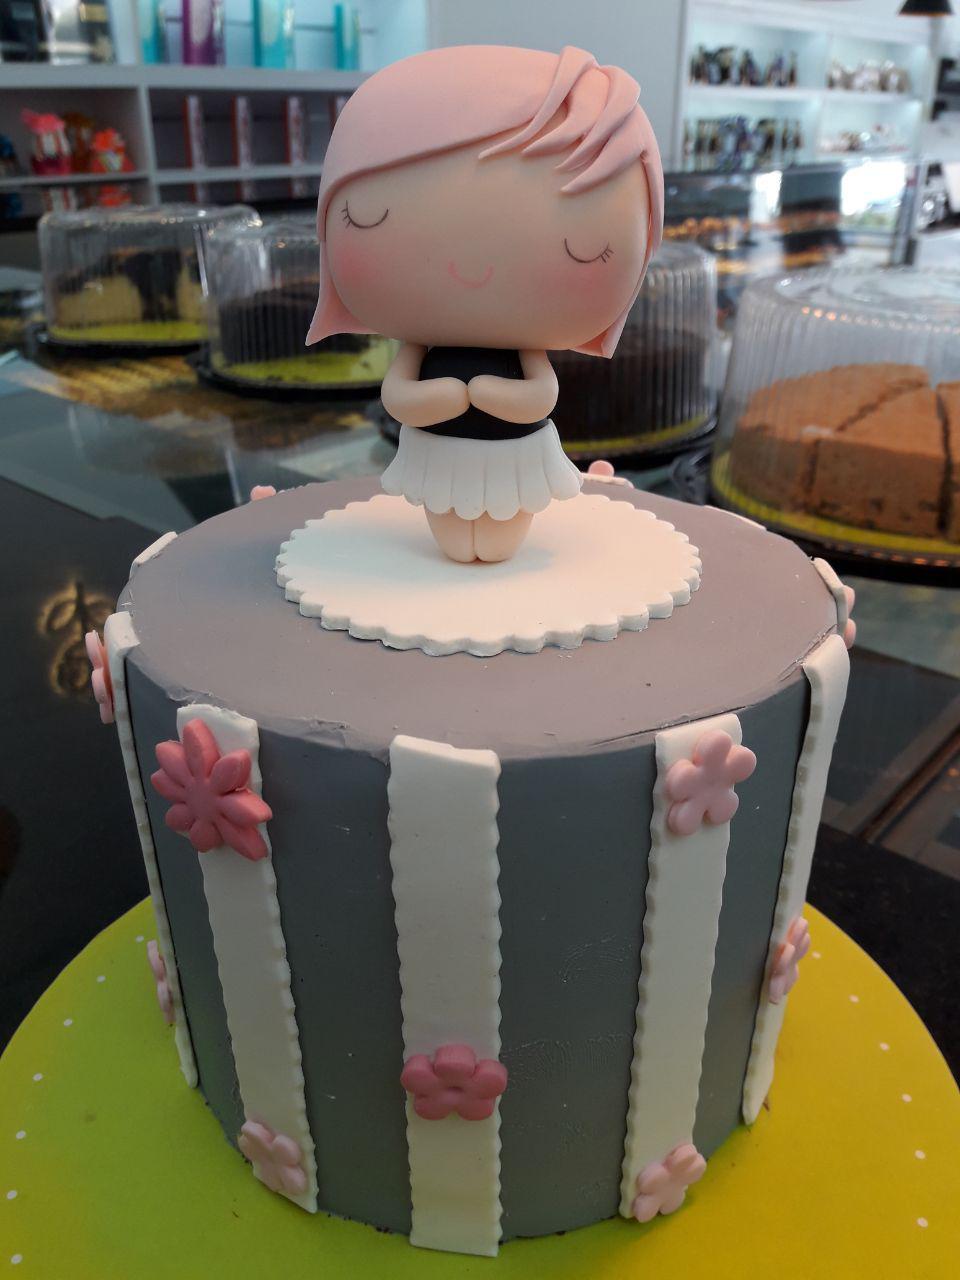 بریم شیرینی 1